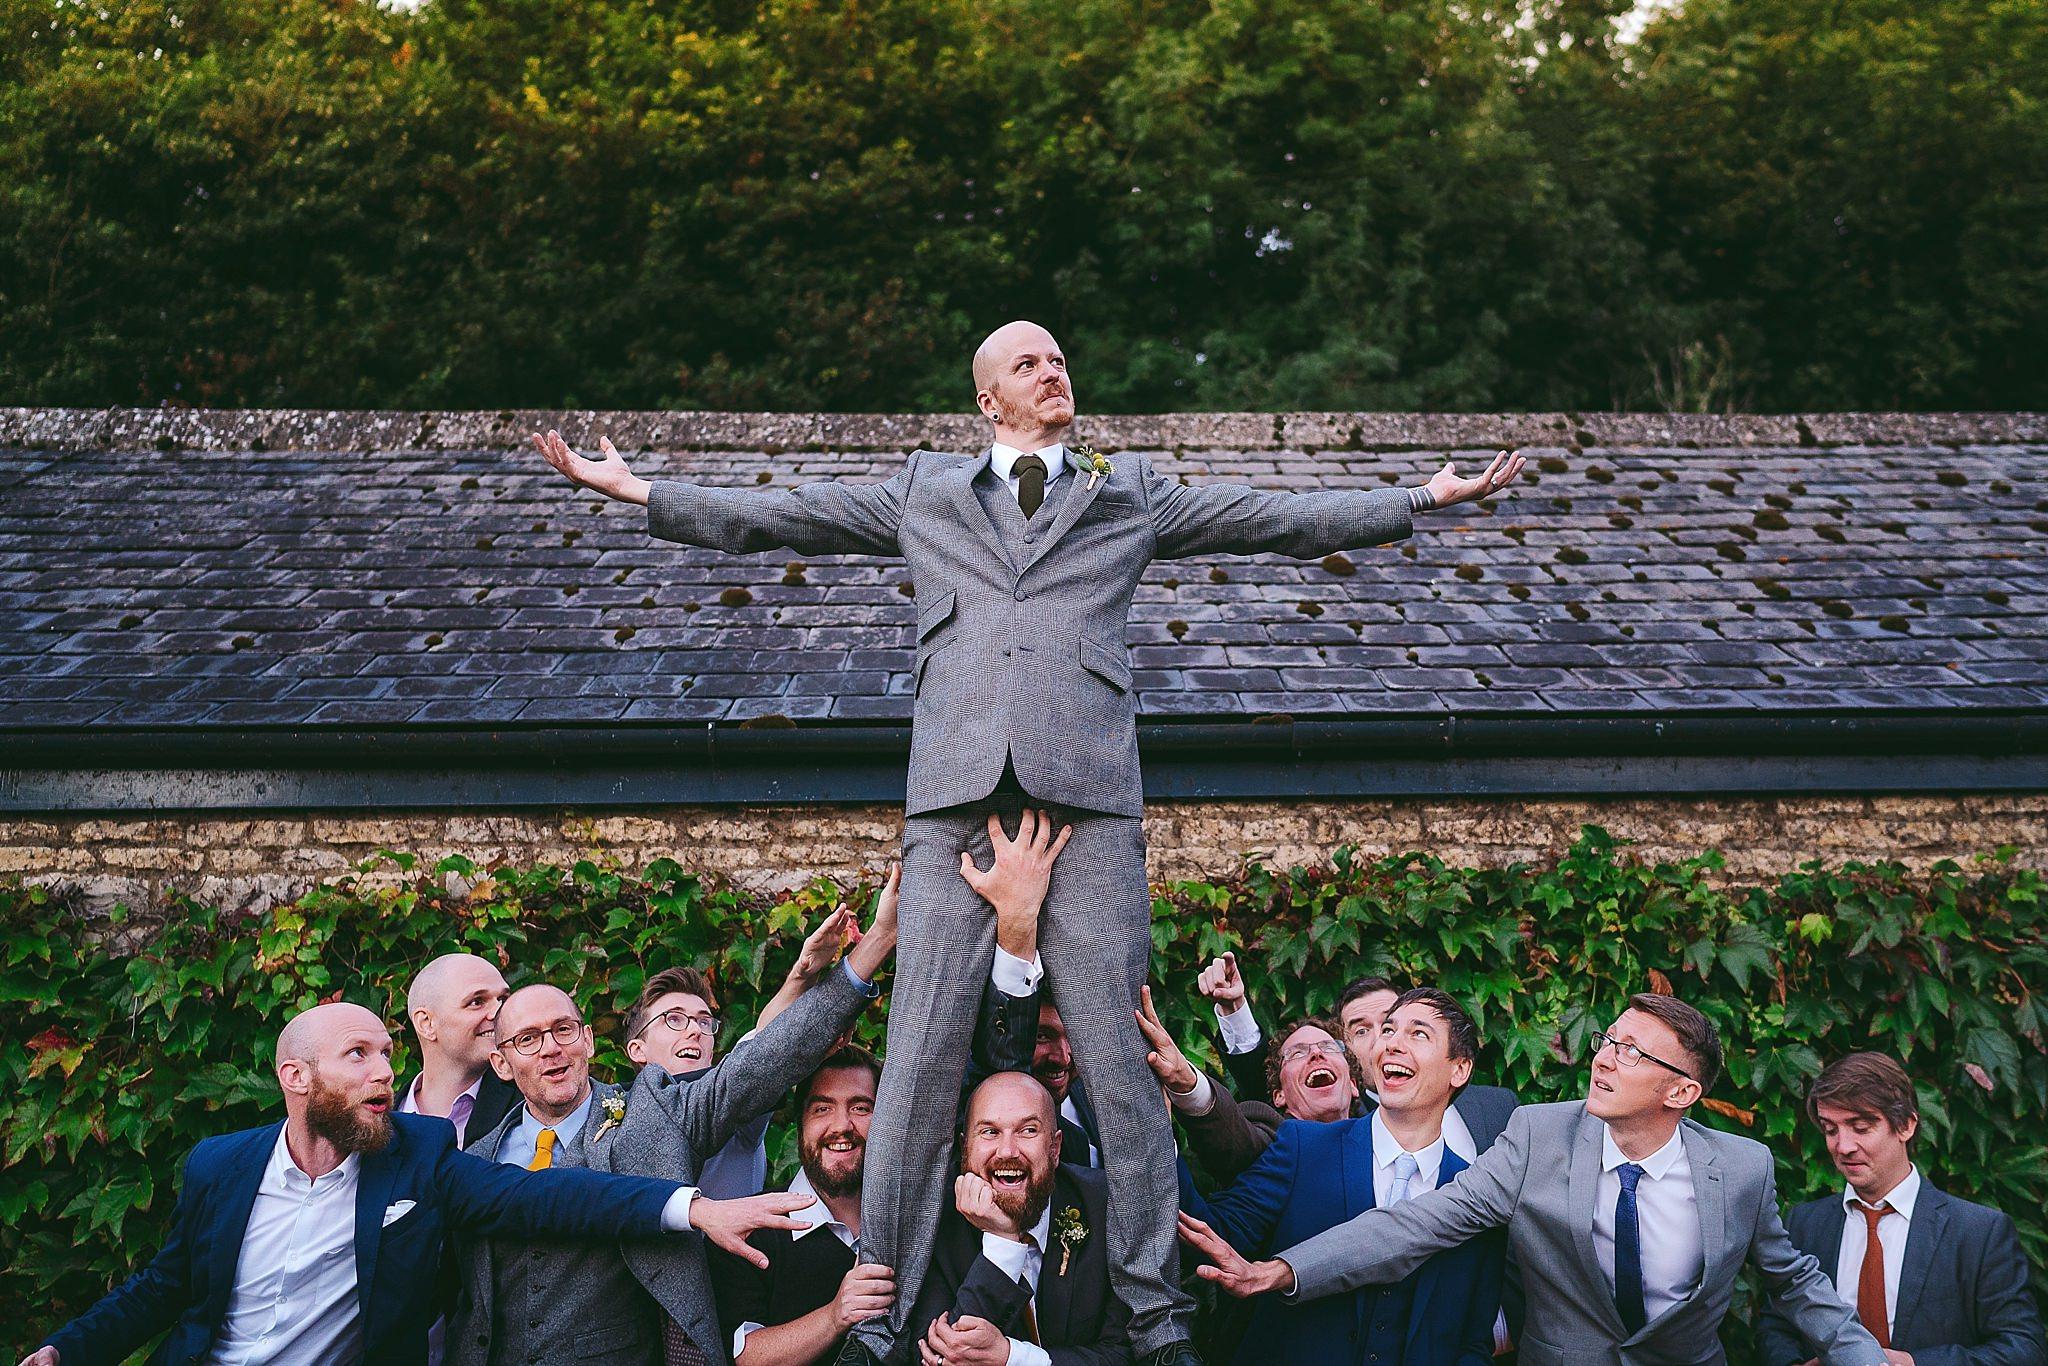 aga-tomaszek-wedding-photographer-cardiff-2016_1052